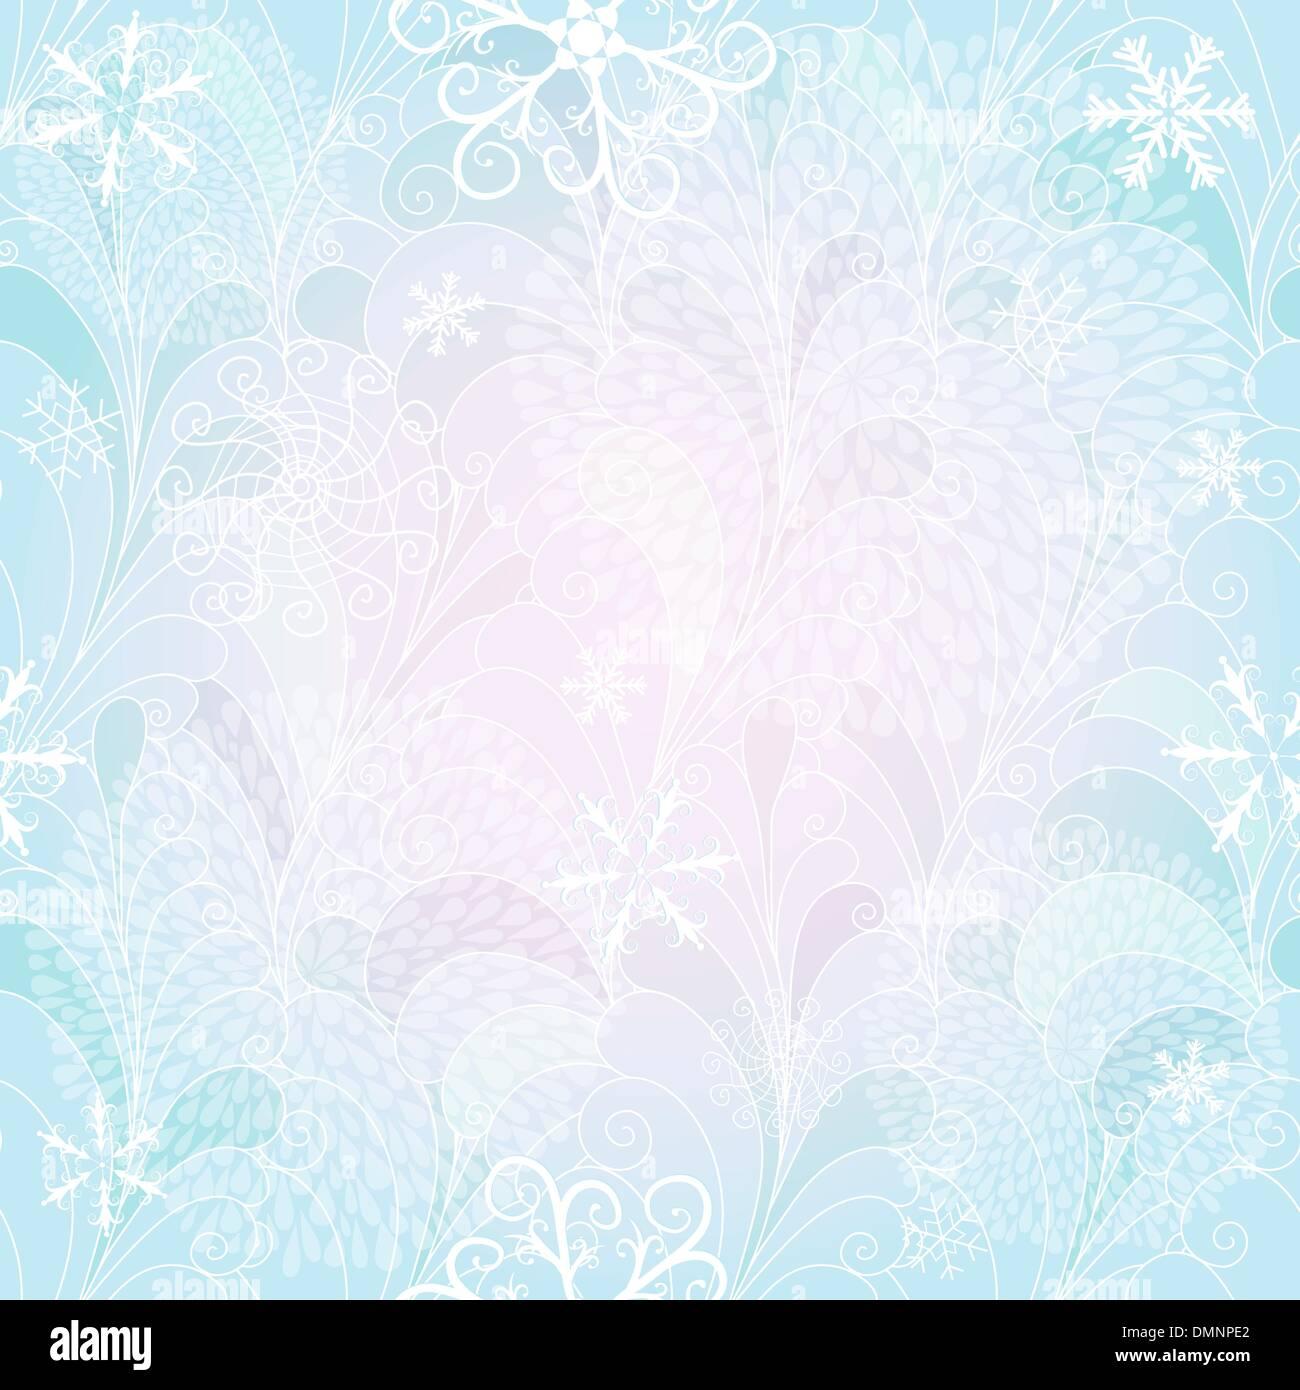 Seamless christmas gentle pattern - Stock Image